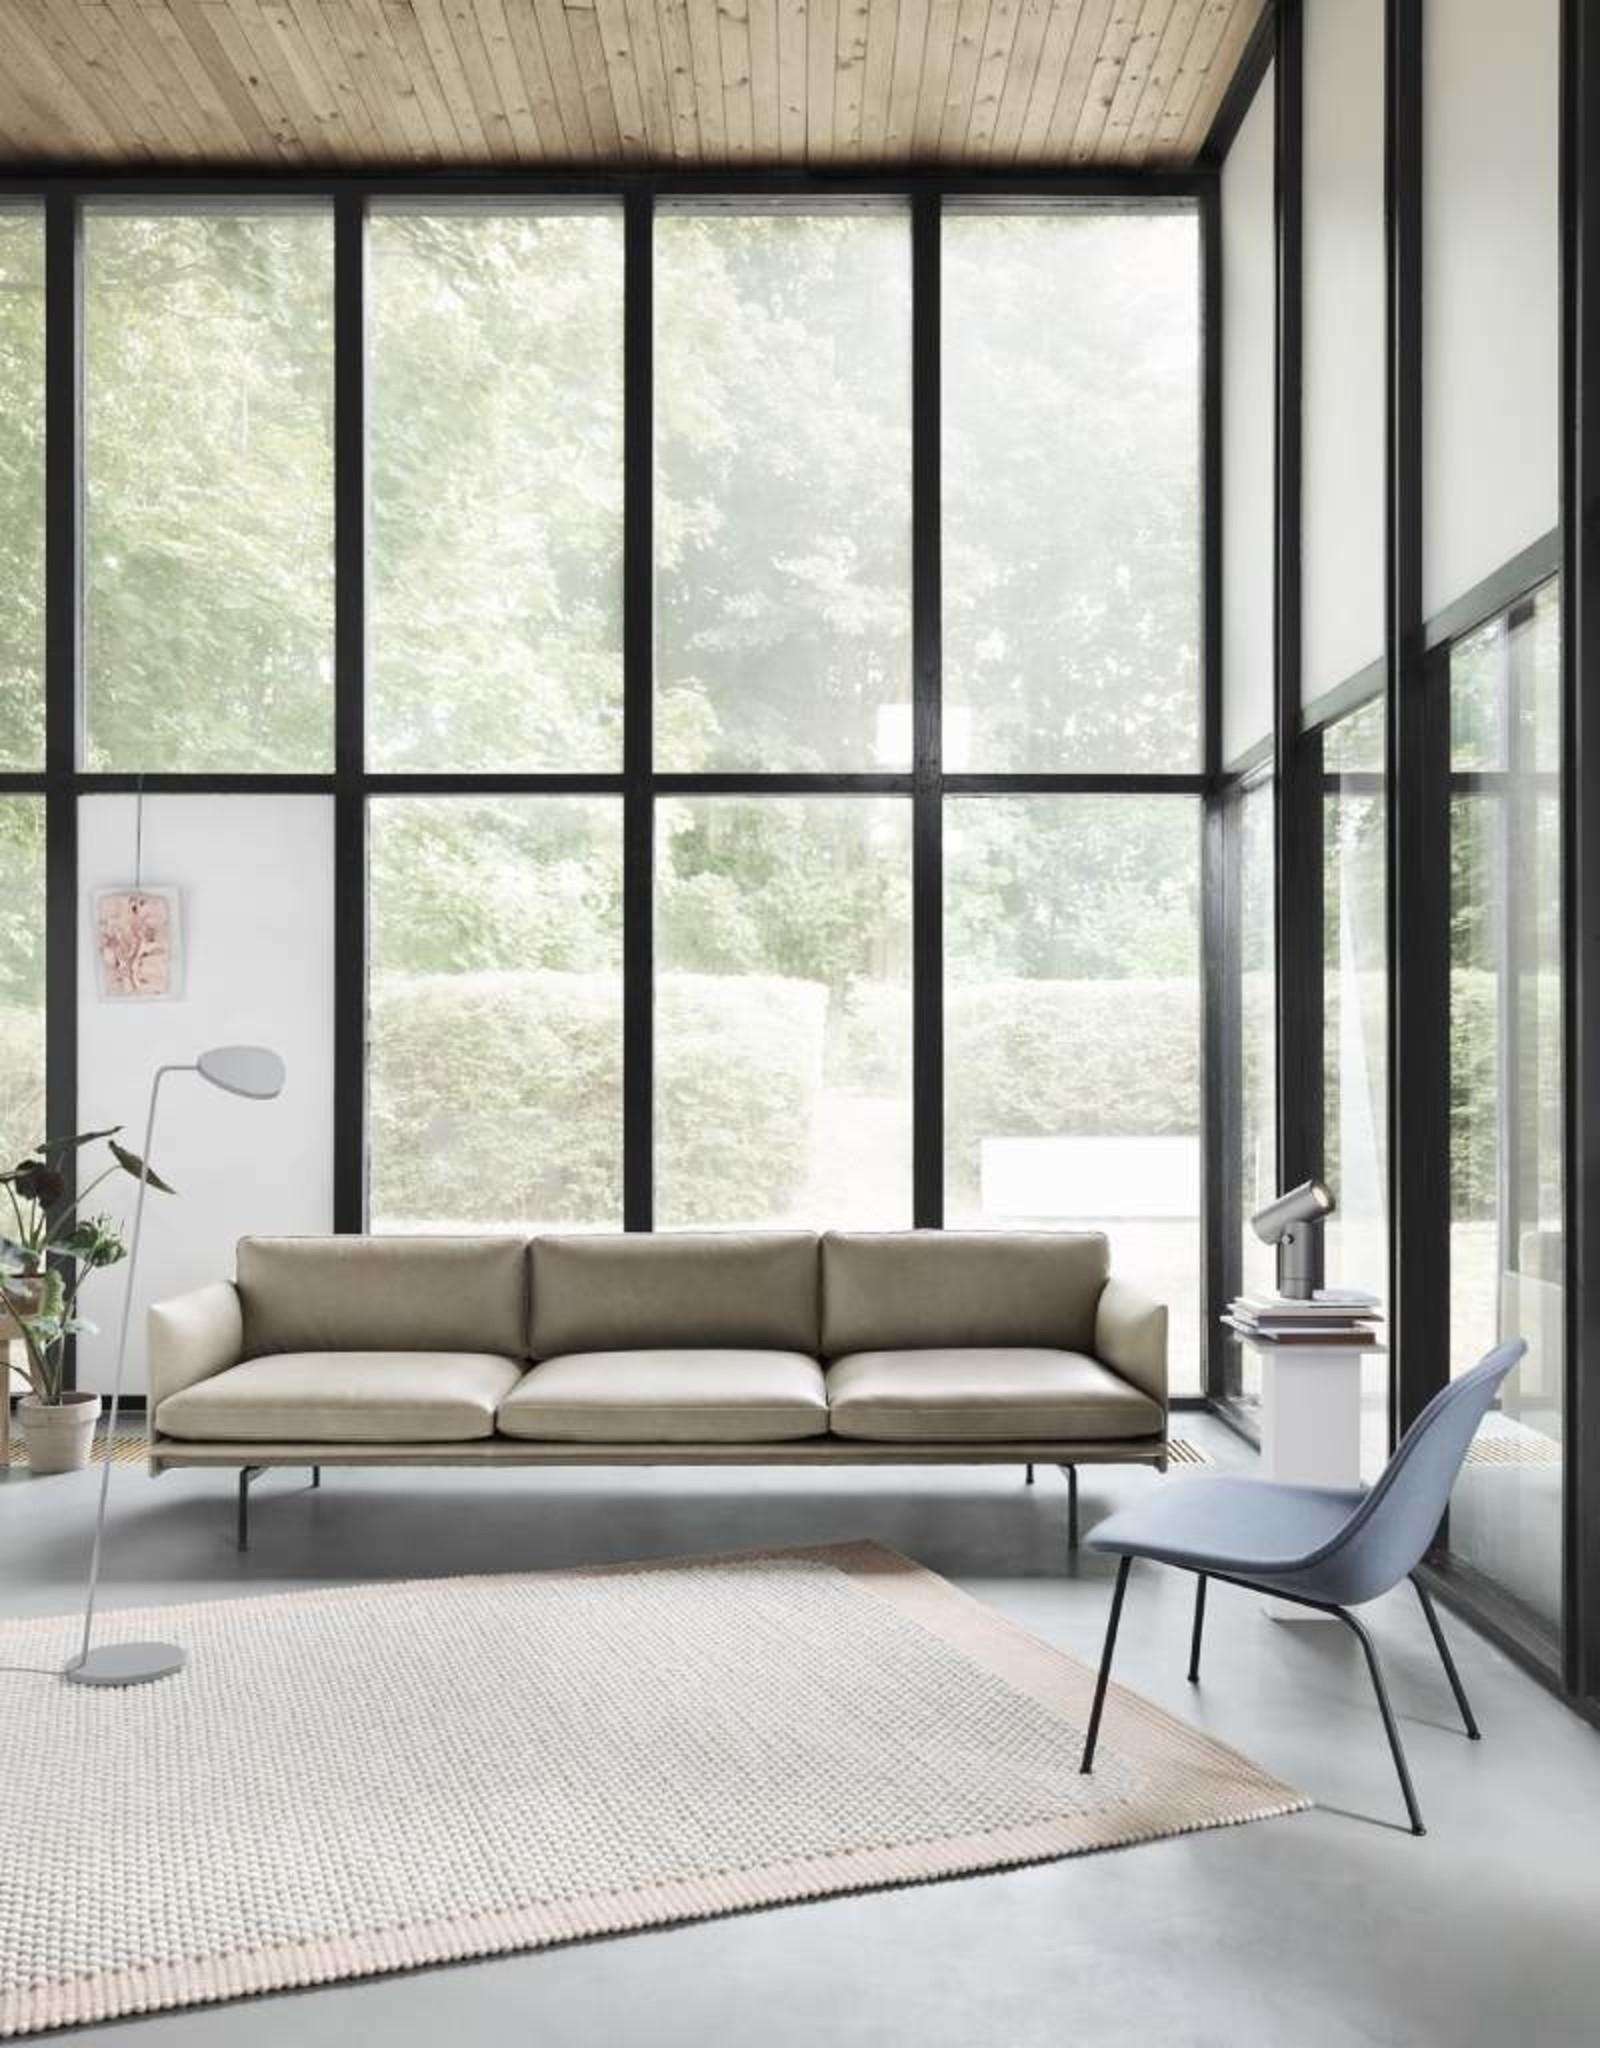 Muuto Muuto Outline Sofa